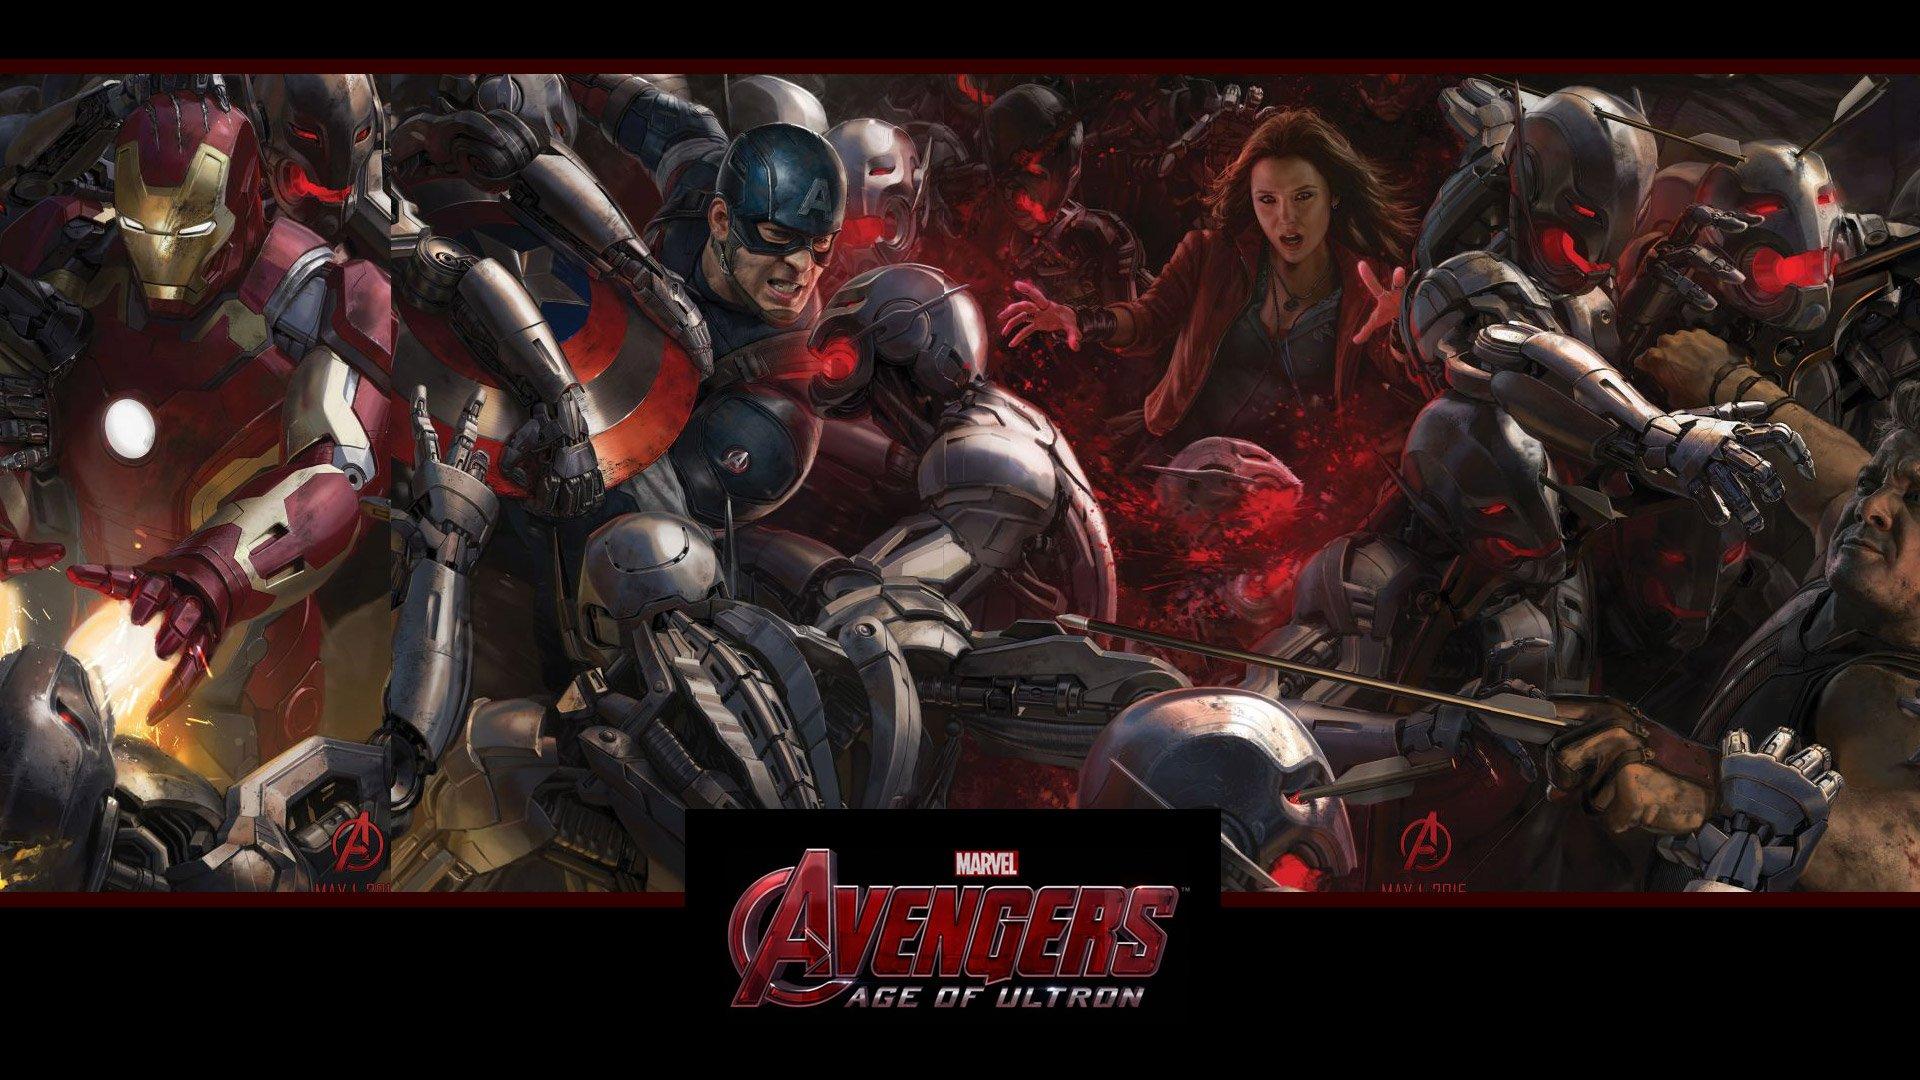 Hawkeye Hd Wallpapers Avengers 2 Age Of Ultron 2015 Desktop Amp Iphone Wallpapers Hd